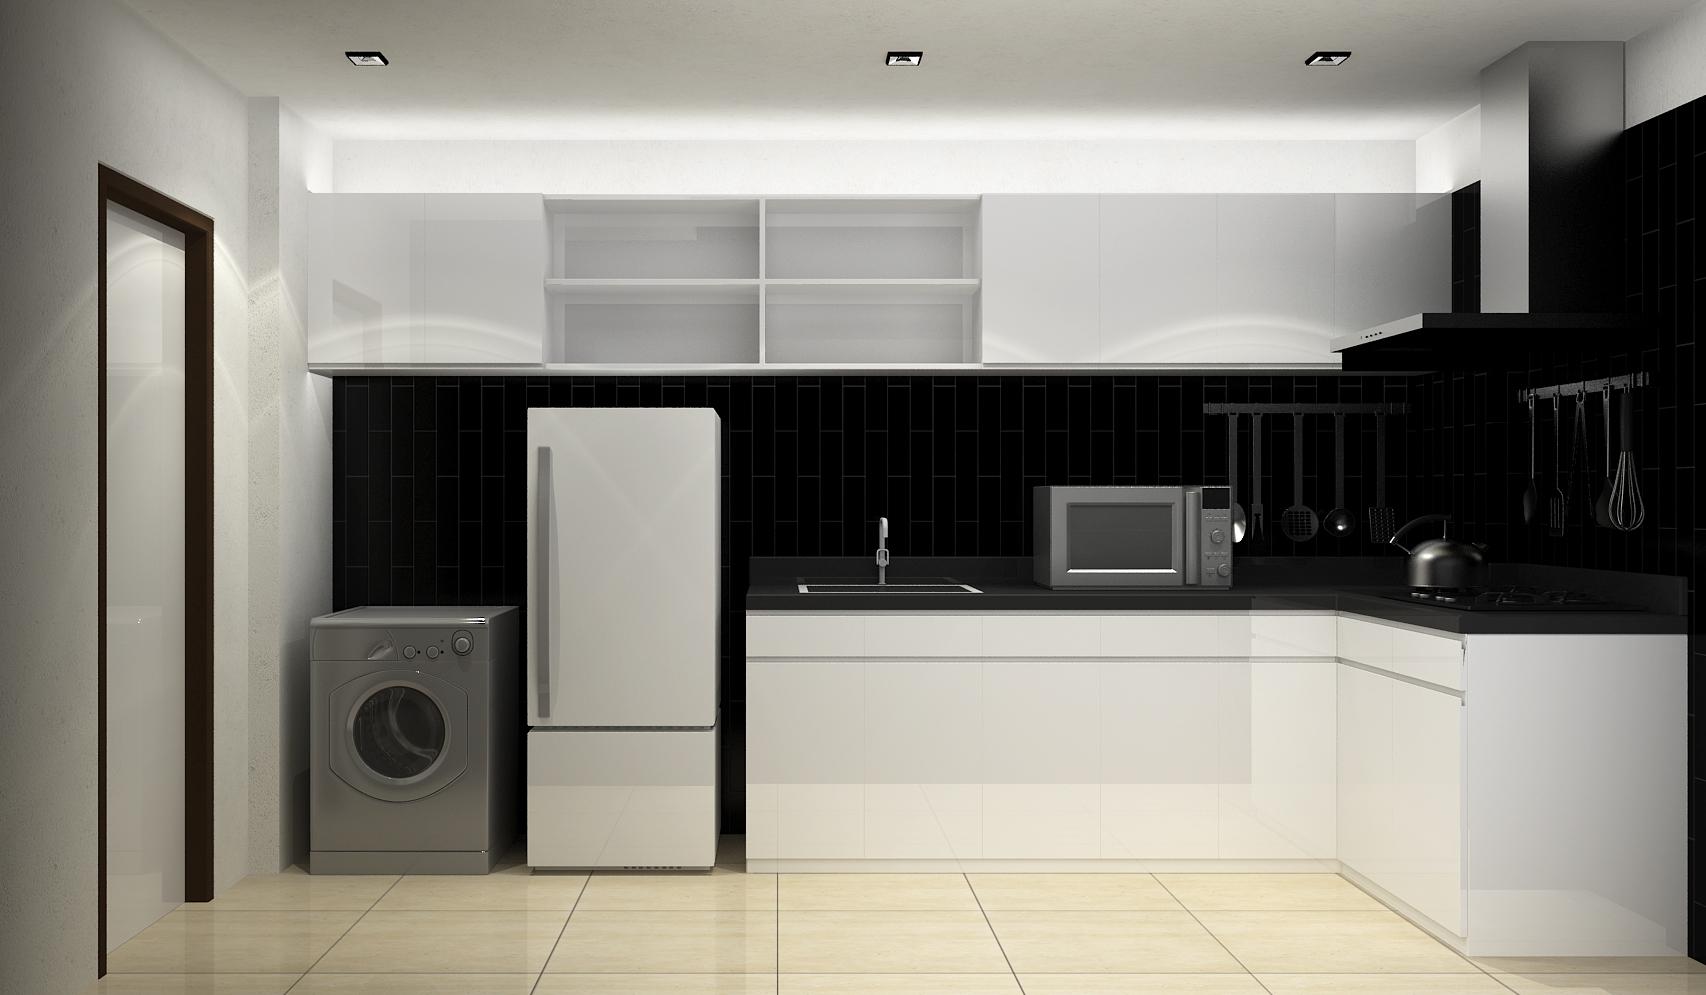 Gd model house kitchen by ab4966 on deviantart for House kitchen model